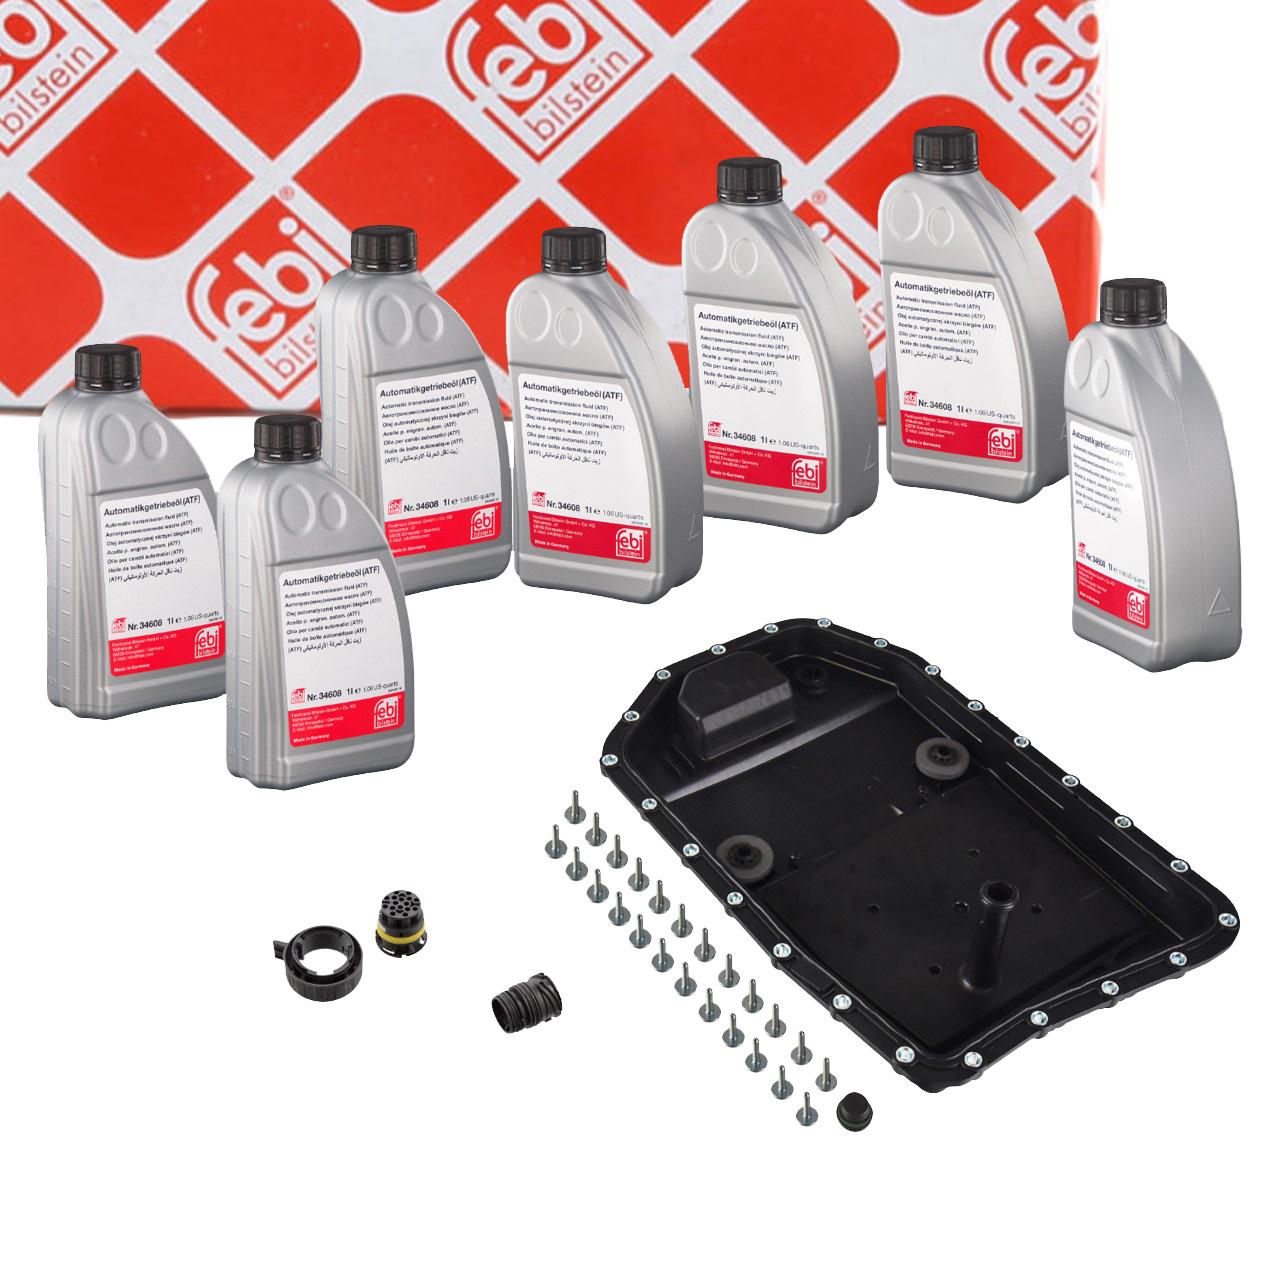 FEBI 171754 Automatikgetriebe Reparatursatz + 7L Getriebeöl BMW 6-Gang 6HP19 6HP21